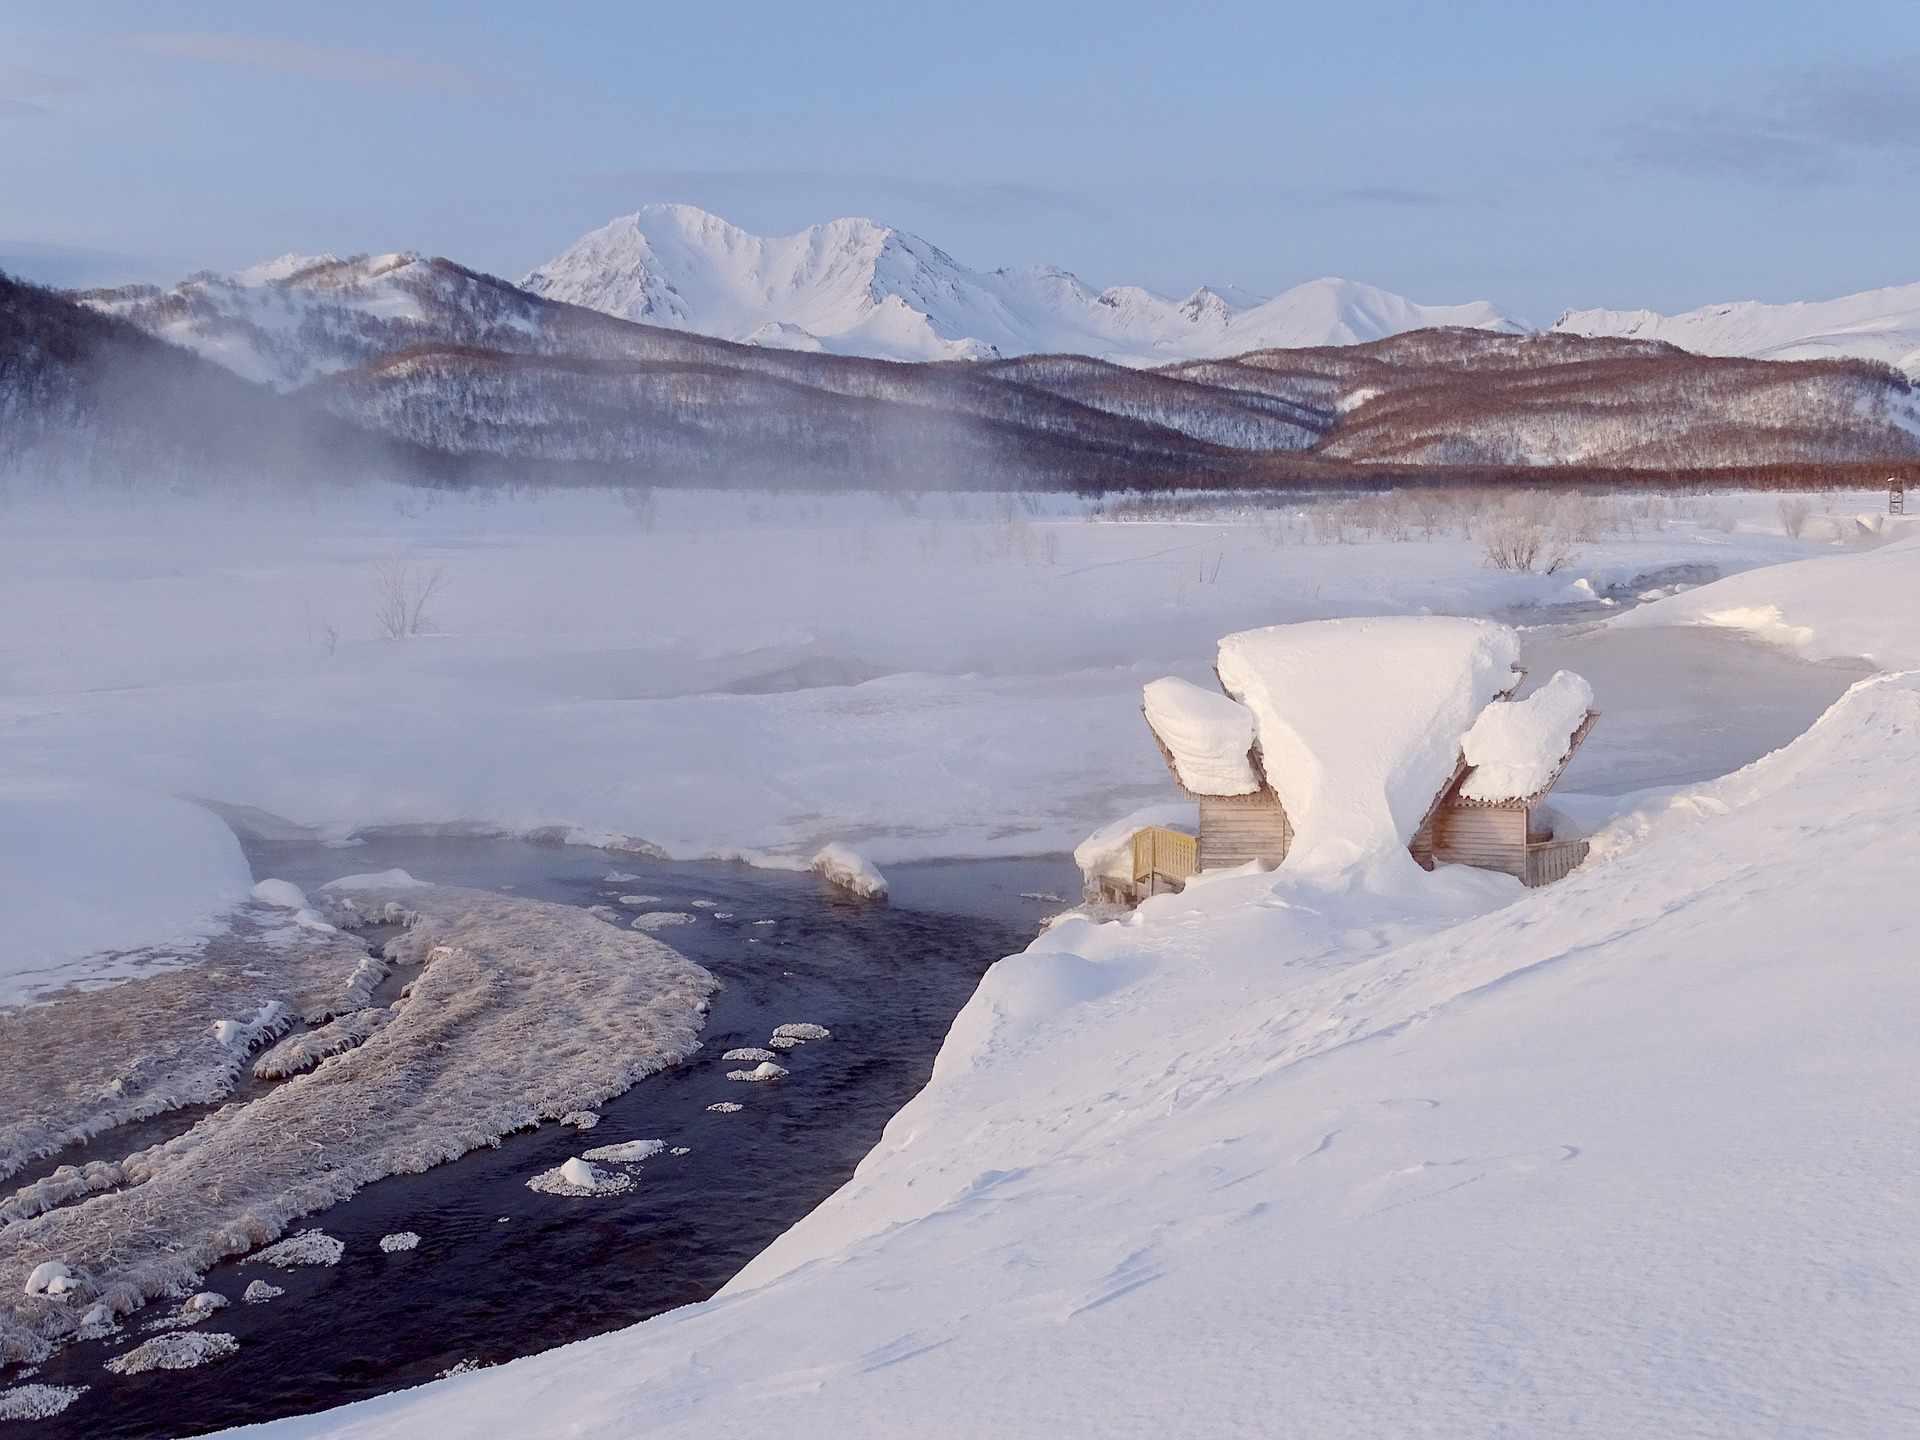 Siberian Hot Springs